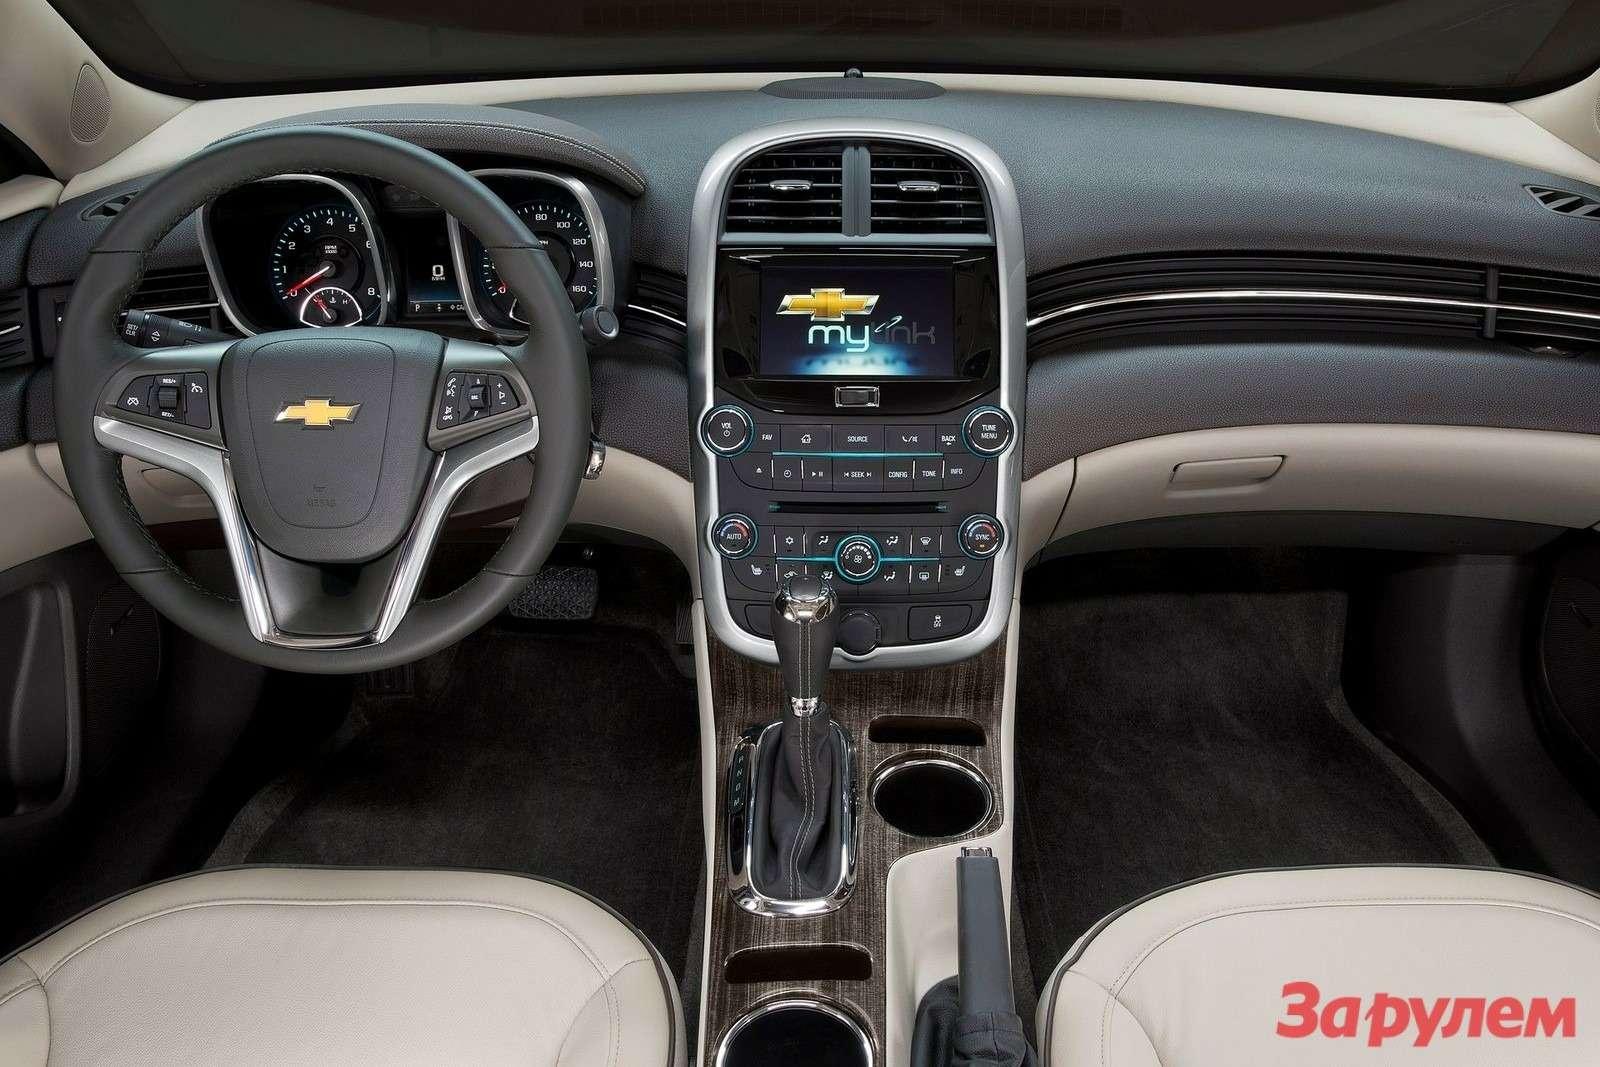 Chevrolet Malibu 2014 1600x1200 wallpaper 06